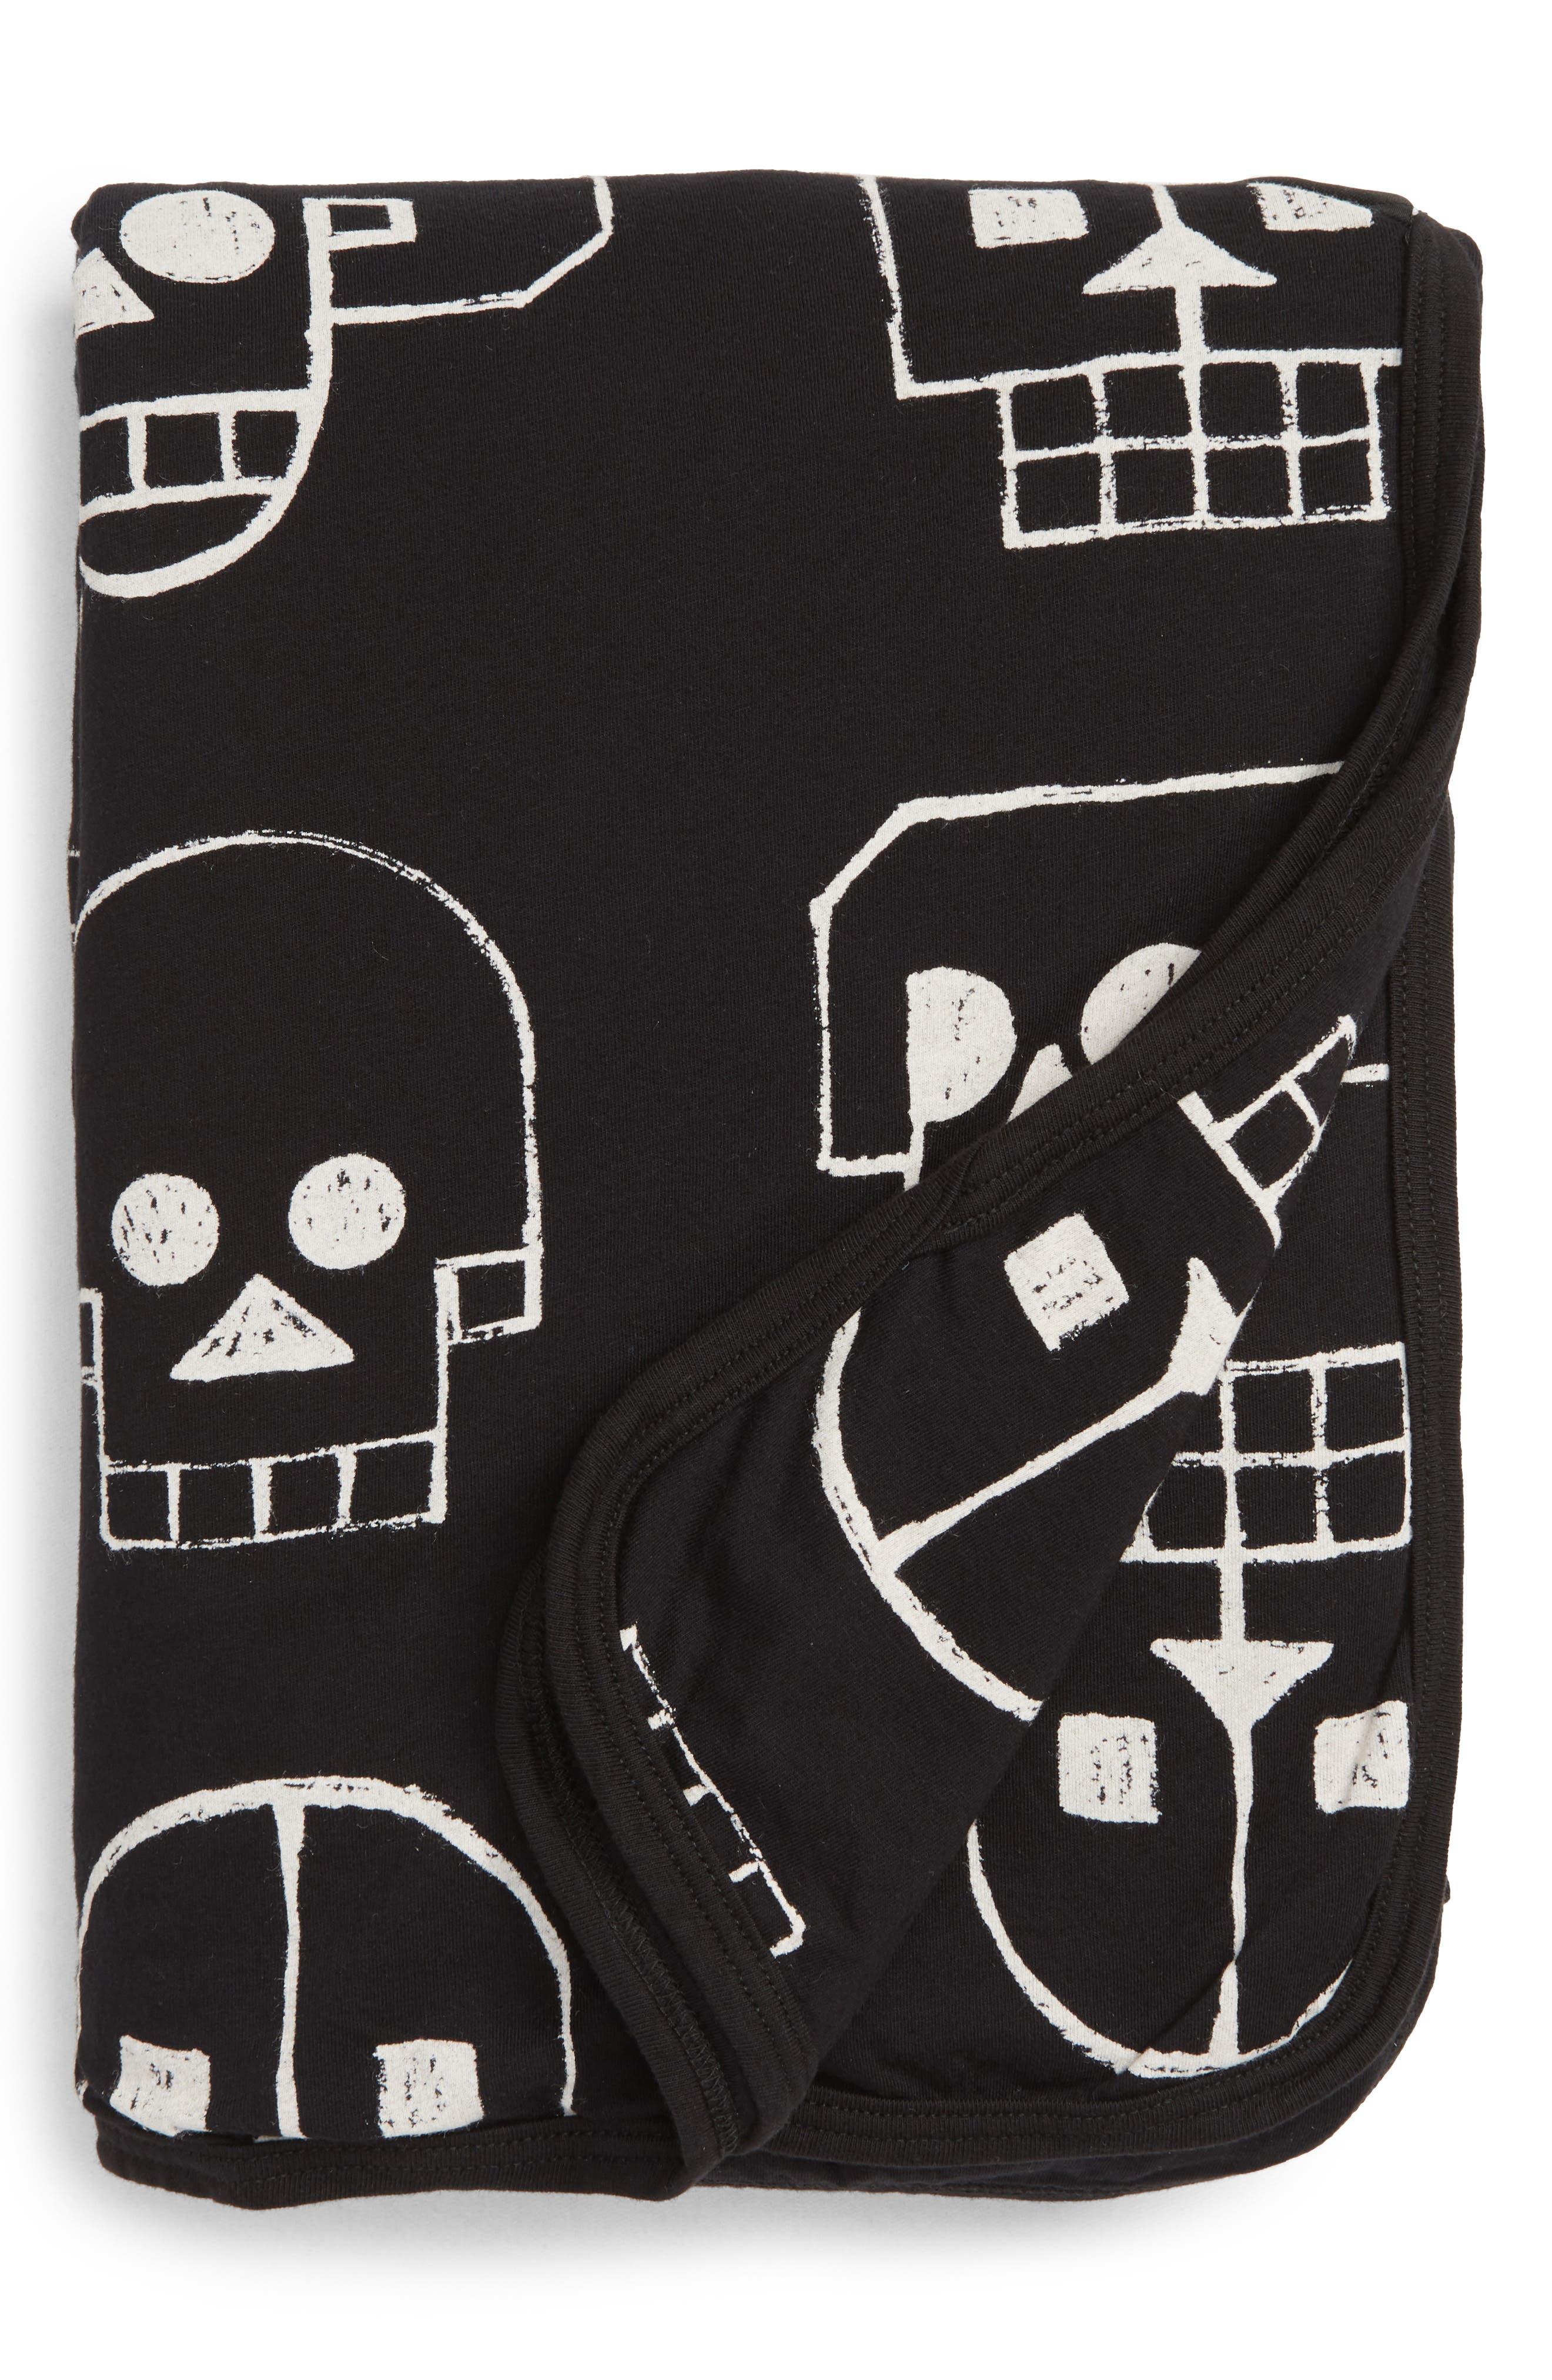 Skull Robot Print Blanket,                         Main,                         color, BLACK